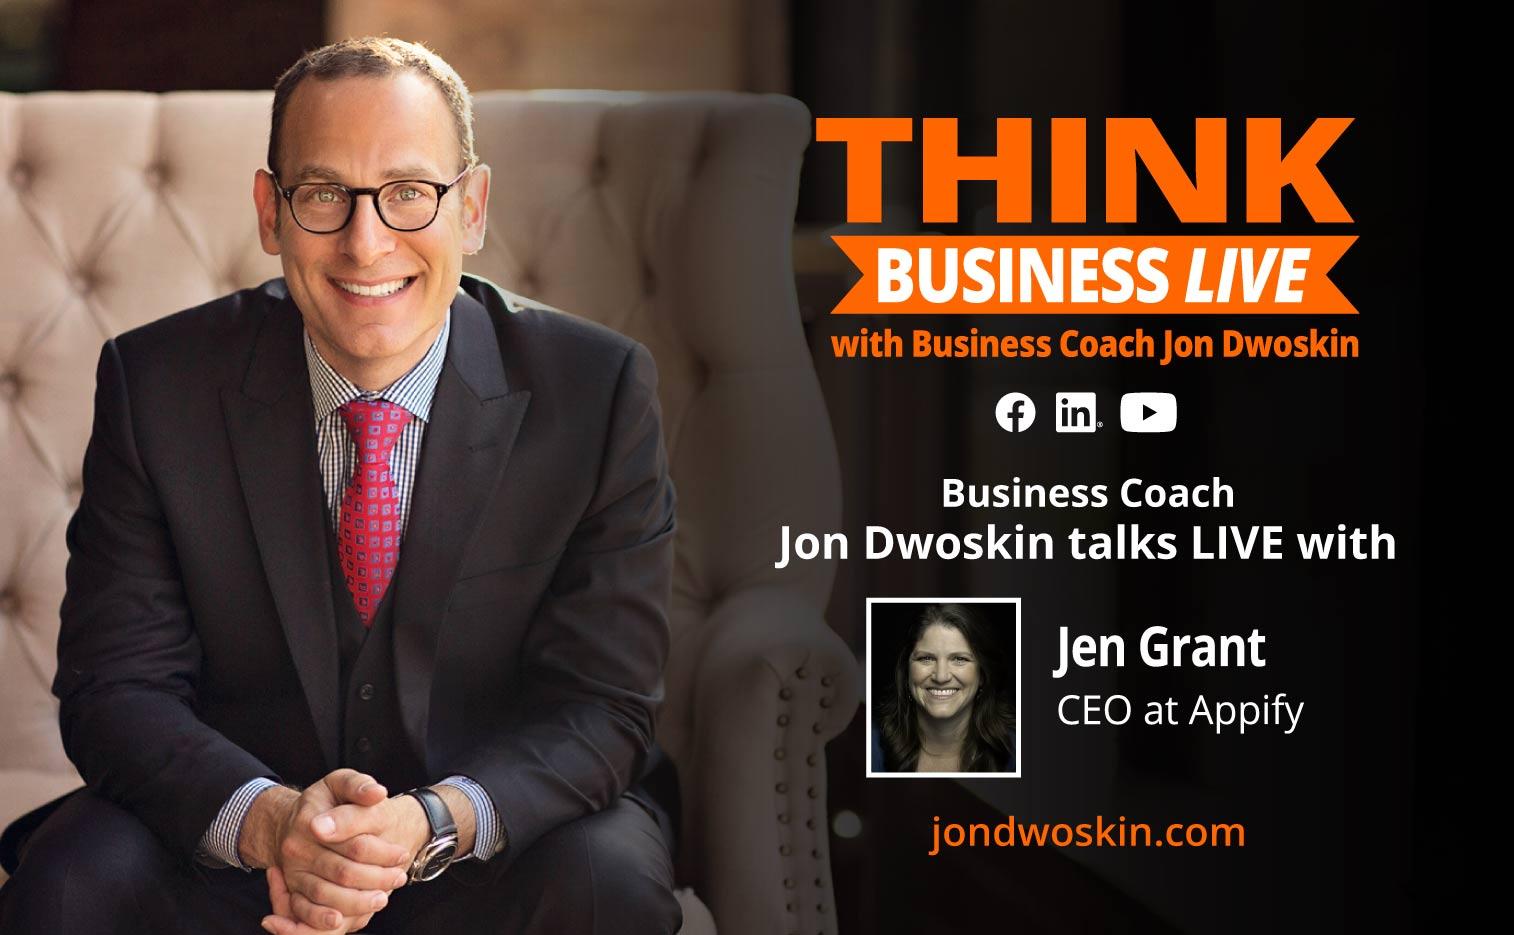 THINK Business LIVE: Jon Dwoskin Talks with Jen Grant